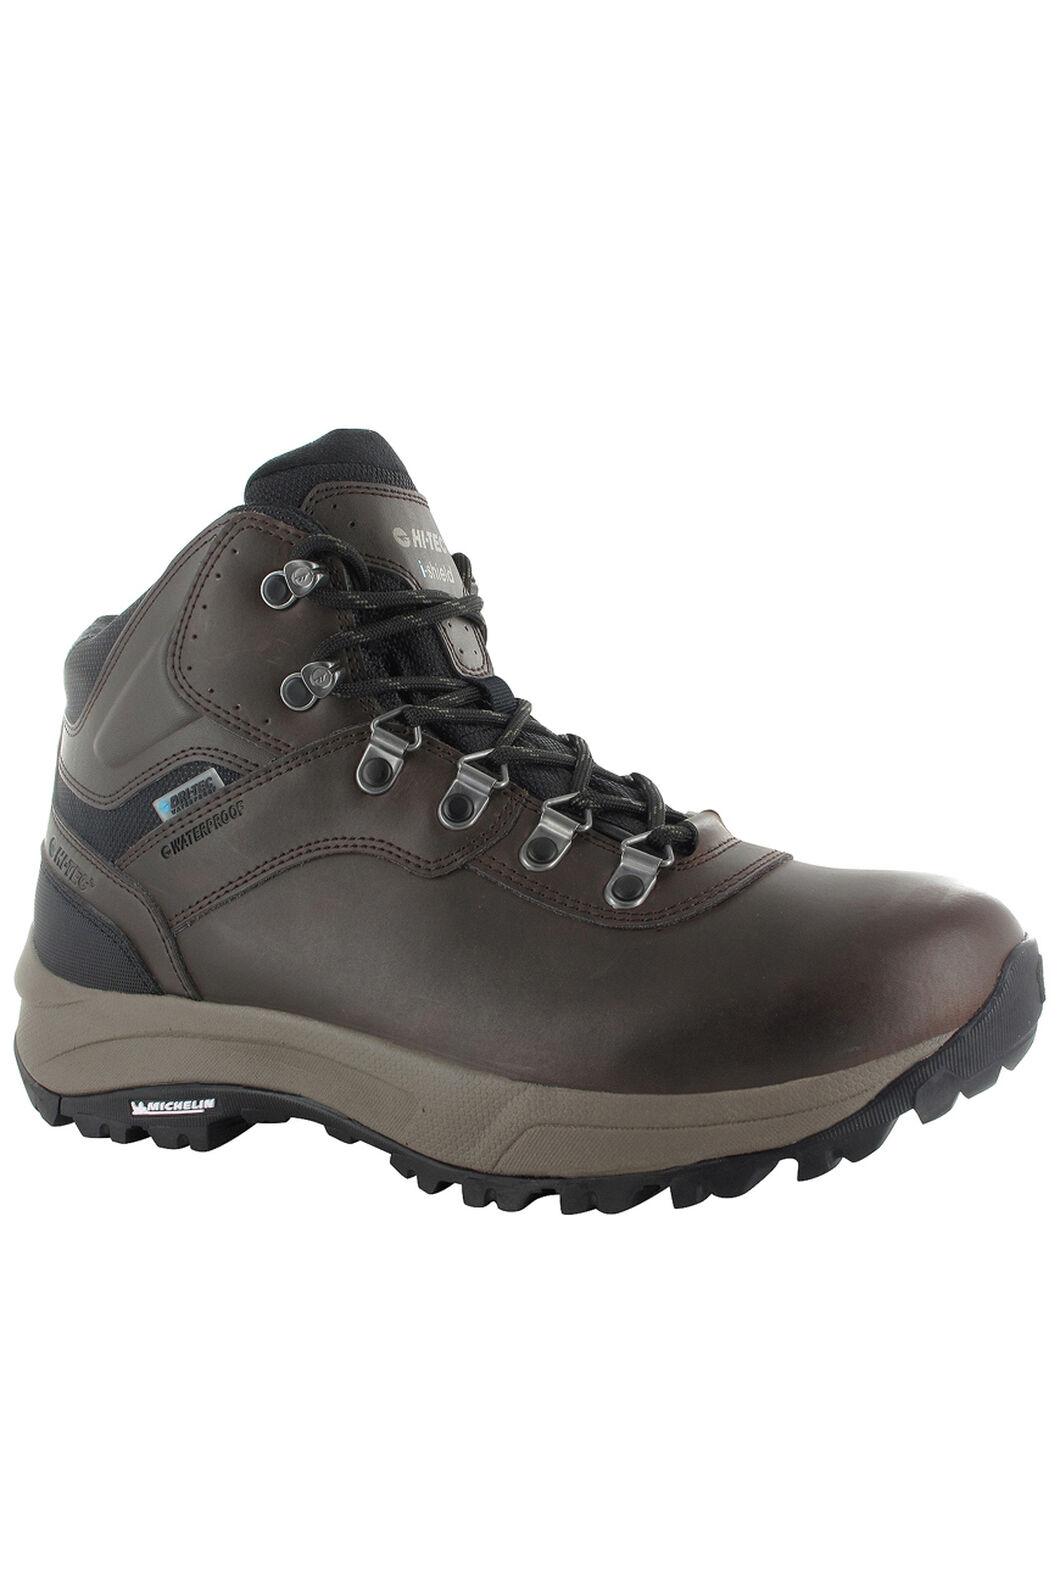 Hi-Tec Men's Altitude VI Hiking Shoes, Dark Chocolate, hi-res